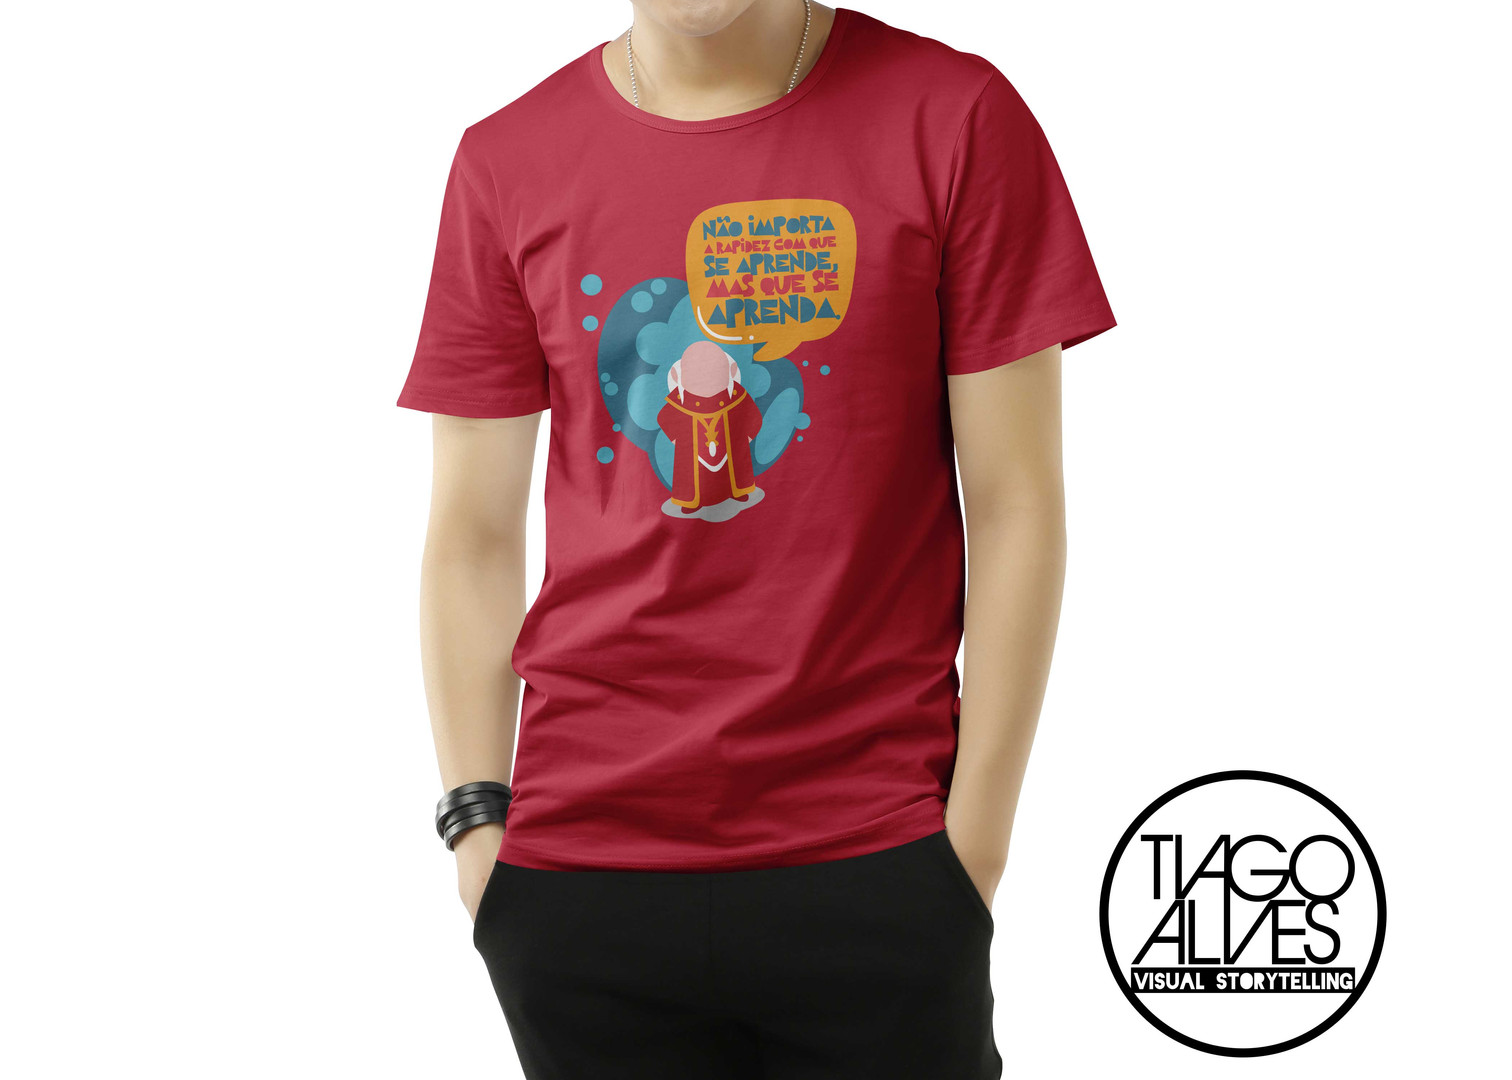 Camiseta-Mestre-dos-magos.jpg